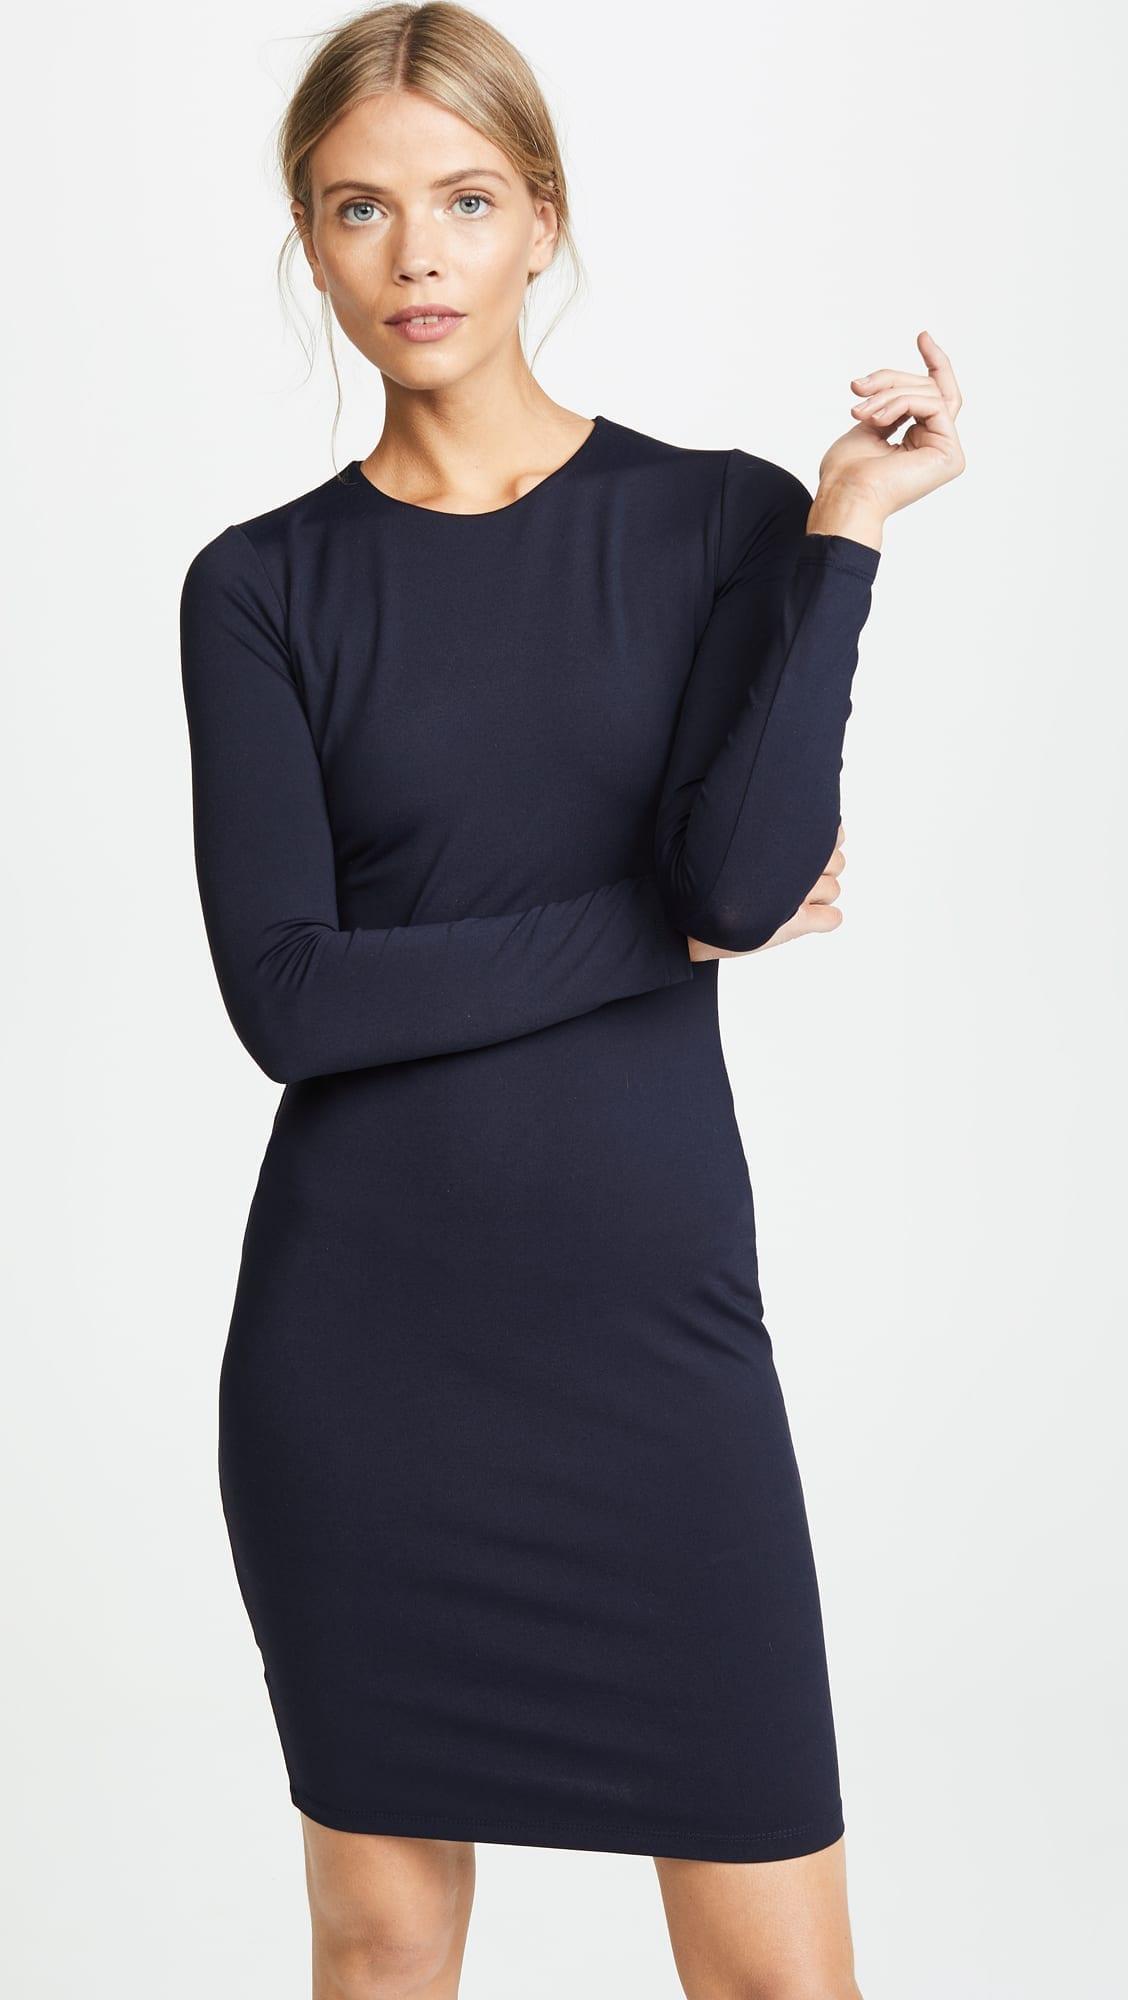 3087d9fe09ed SUSANA MONACO Emma Long Sleeve Midnight Dress - We Select Dresses